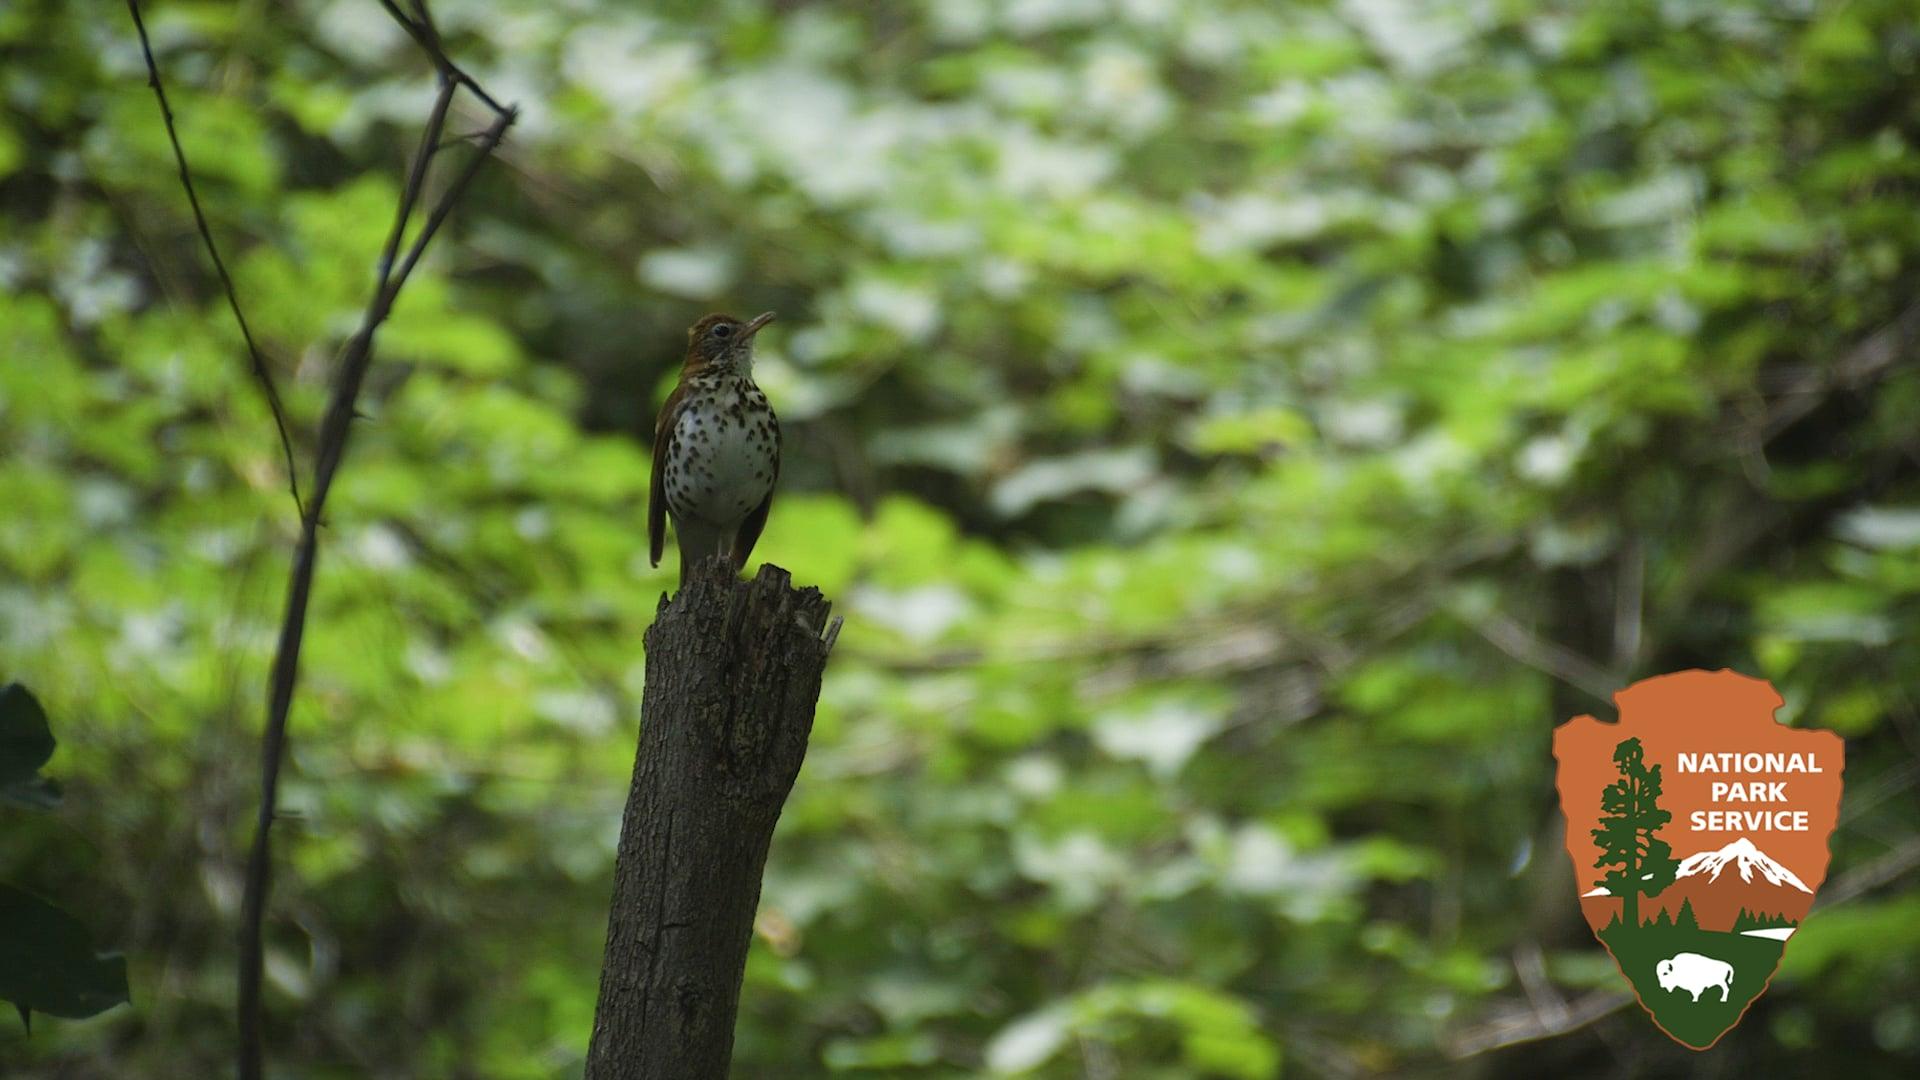 The Wood Thrush: D.C.'s Bird Under Threat